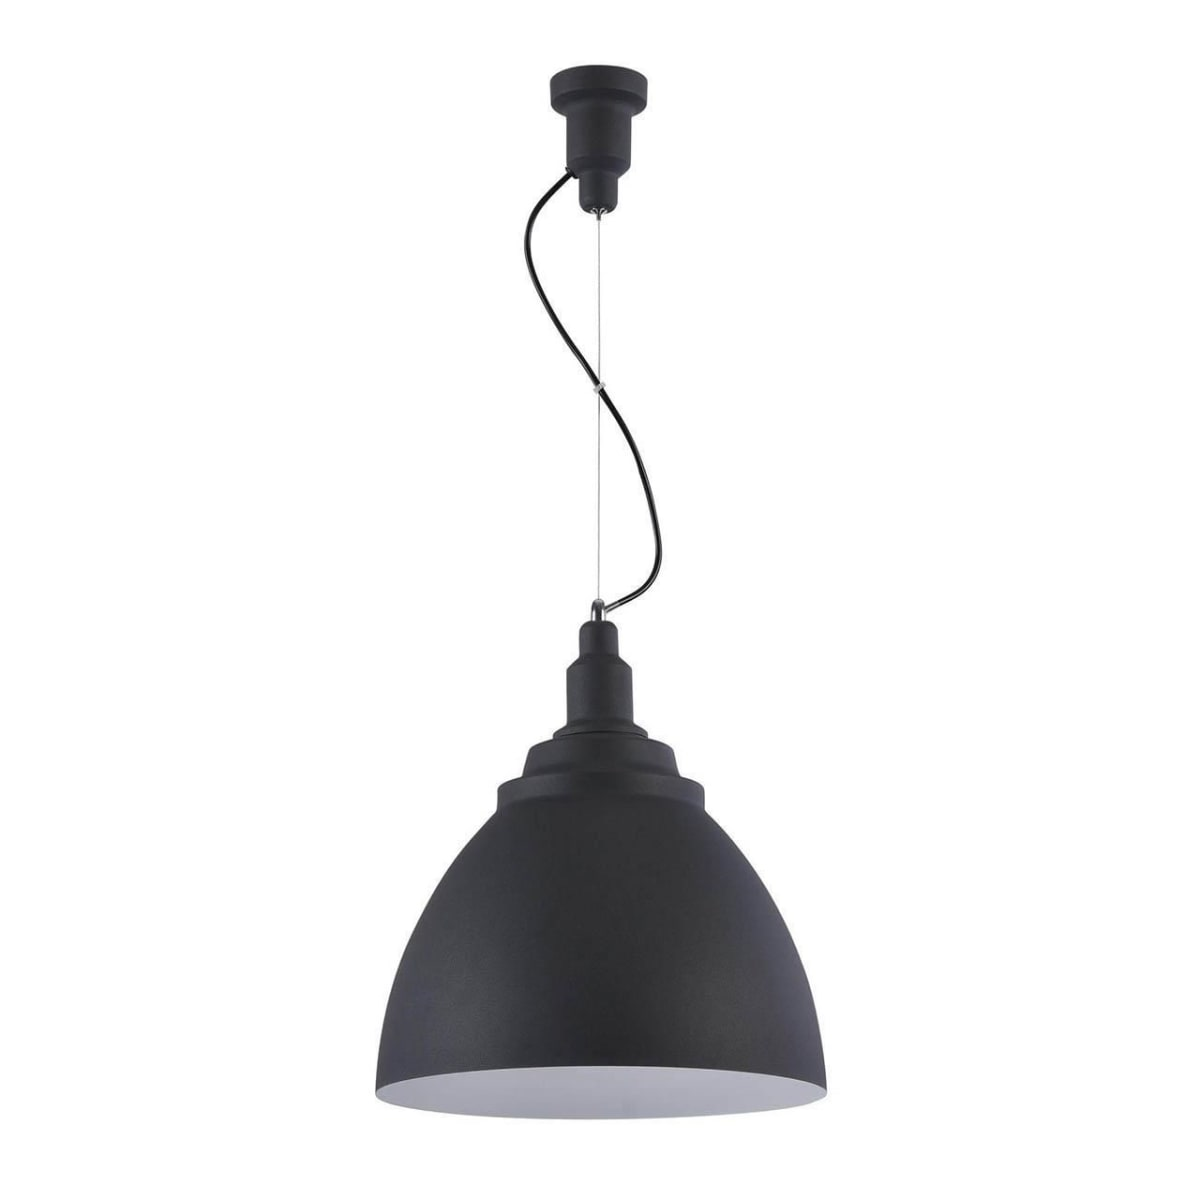 Подвесной светильник Maytoni Bellevue P535PL-01B E27 1 ламп 3.30 м²